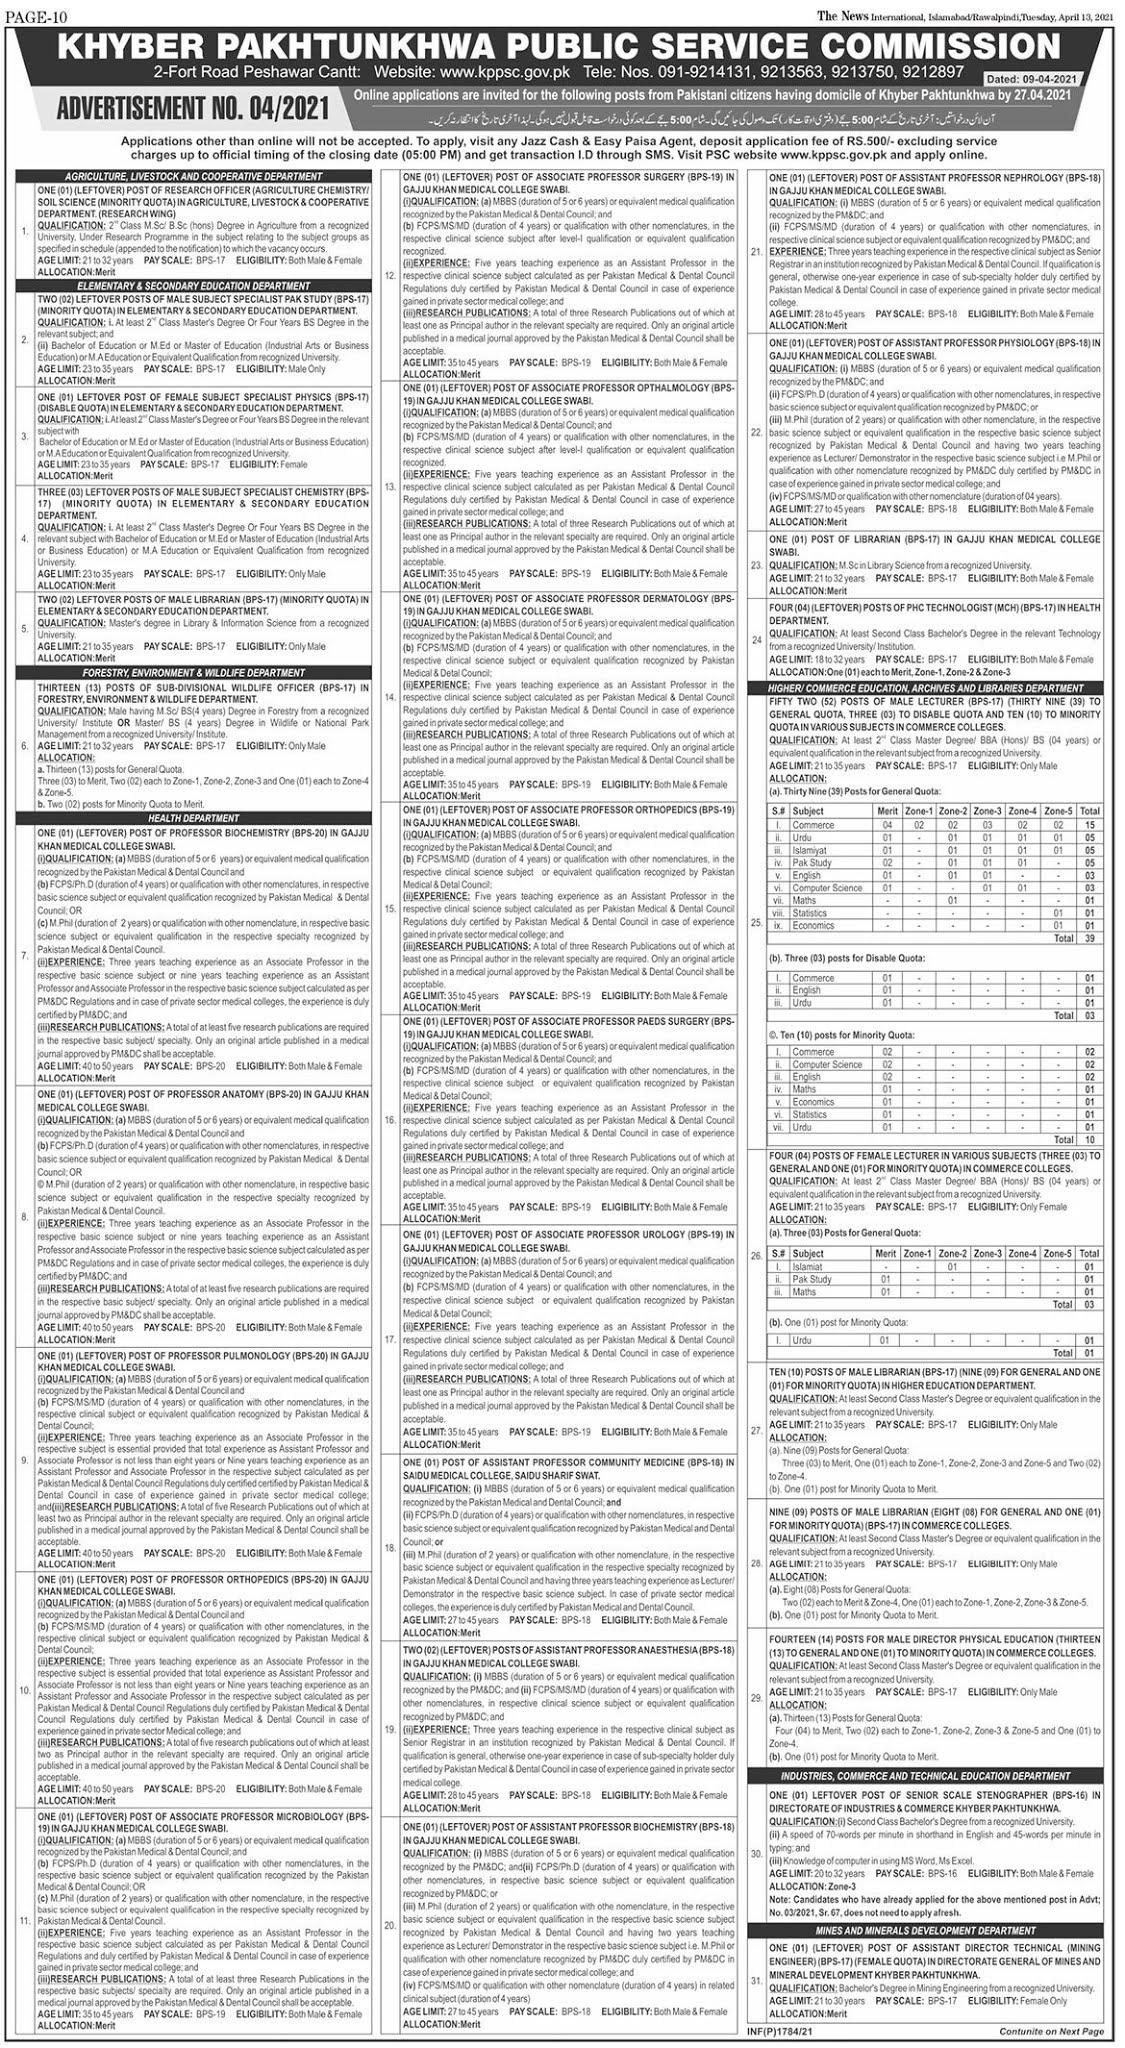 www.kppsc.gov.pk Jobs 2021 - KPPSC New Advertisement 2021 - Khyber Pakhtunkhwa Public Service Commission KPPSC Jobs 2021 in Pakistan